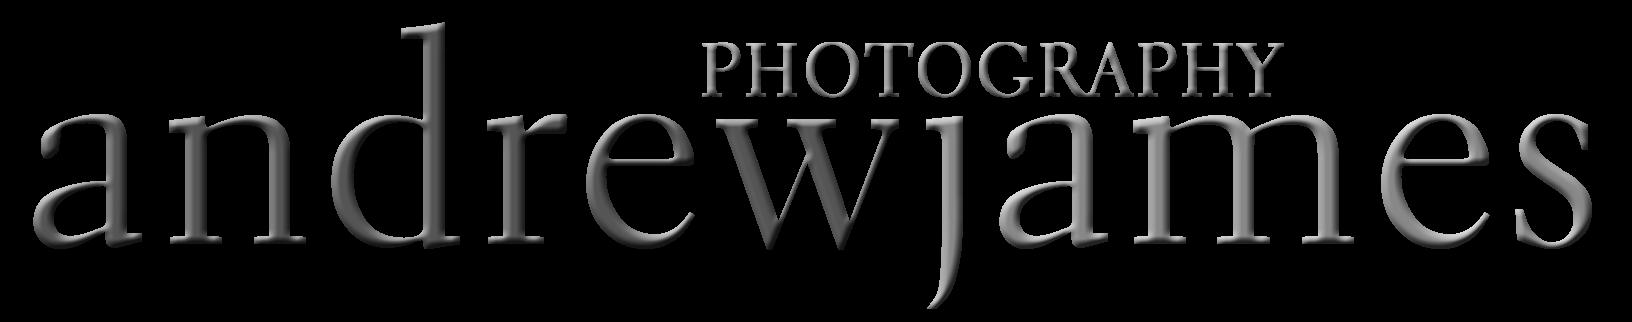 Andrew James Photography